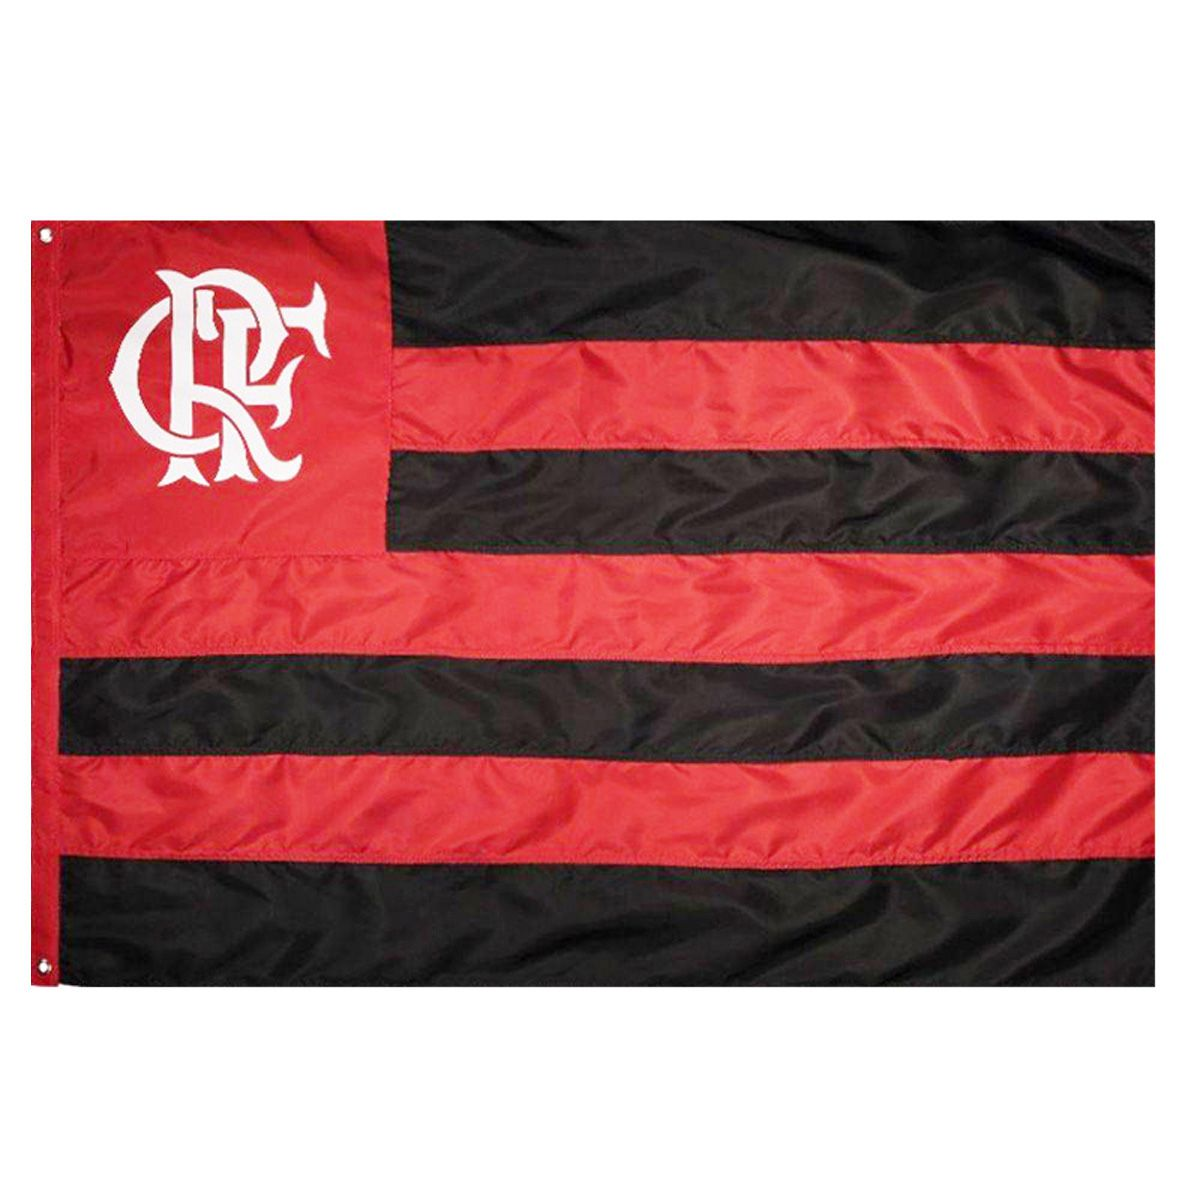 Bandeira Oficial do Flamengo 96 x 68 cm - 1 1/2 pano